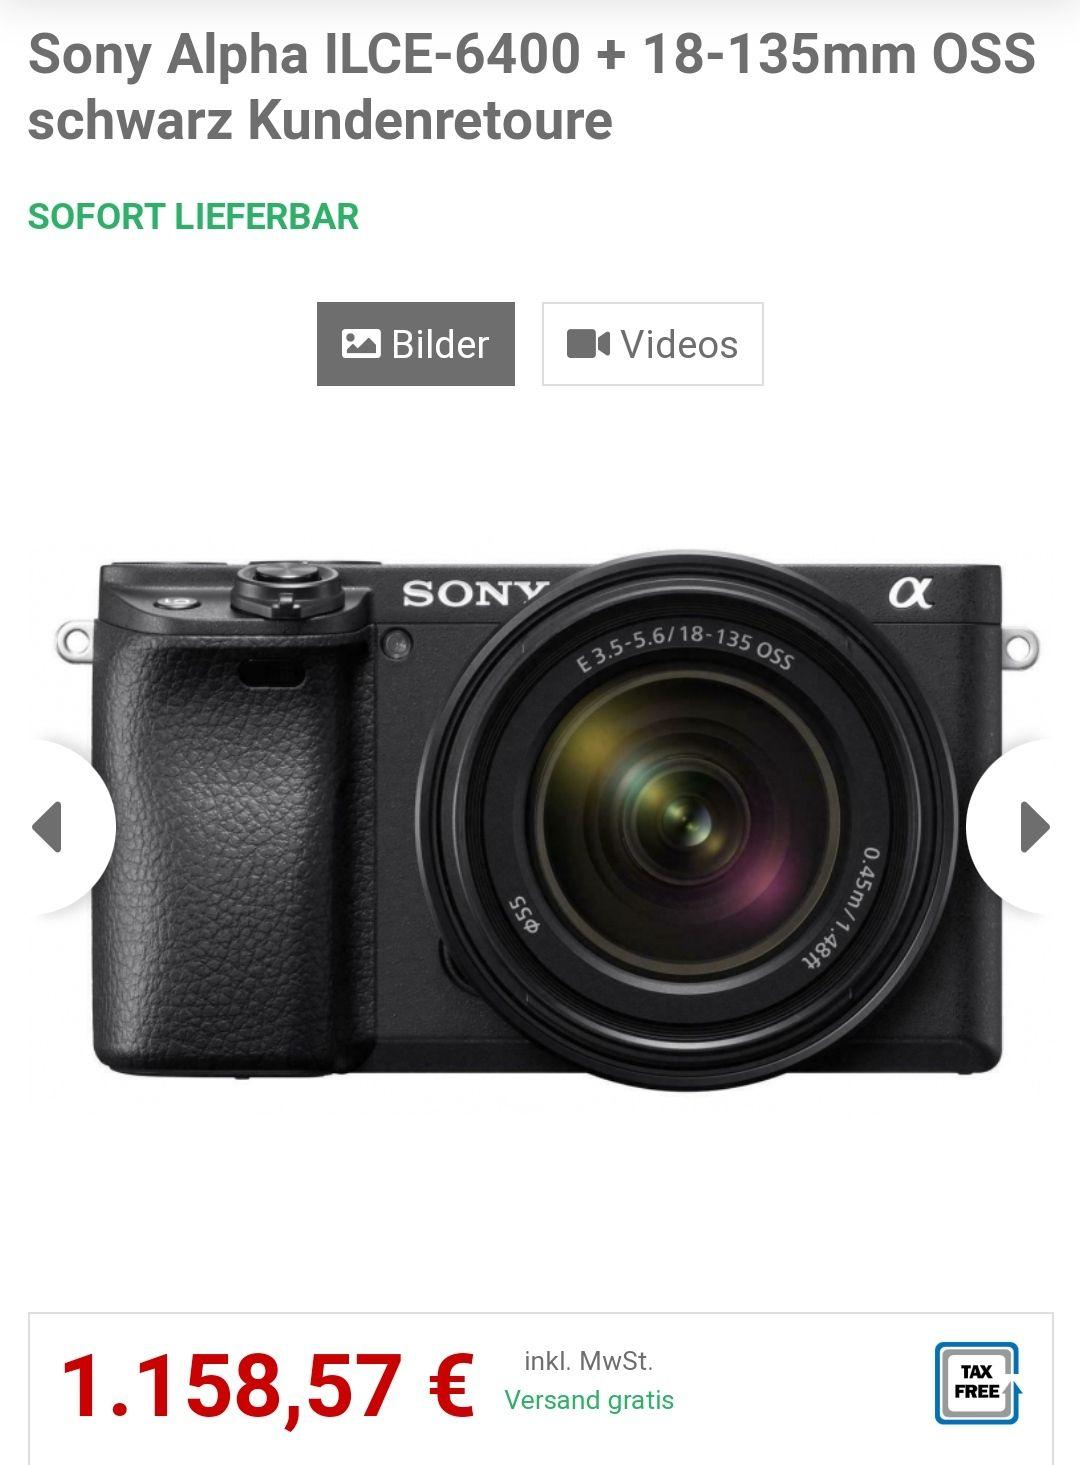 Sony Alpha ILCE-6400 + 18-135mm OSS schwarz Kundenretoure